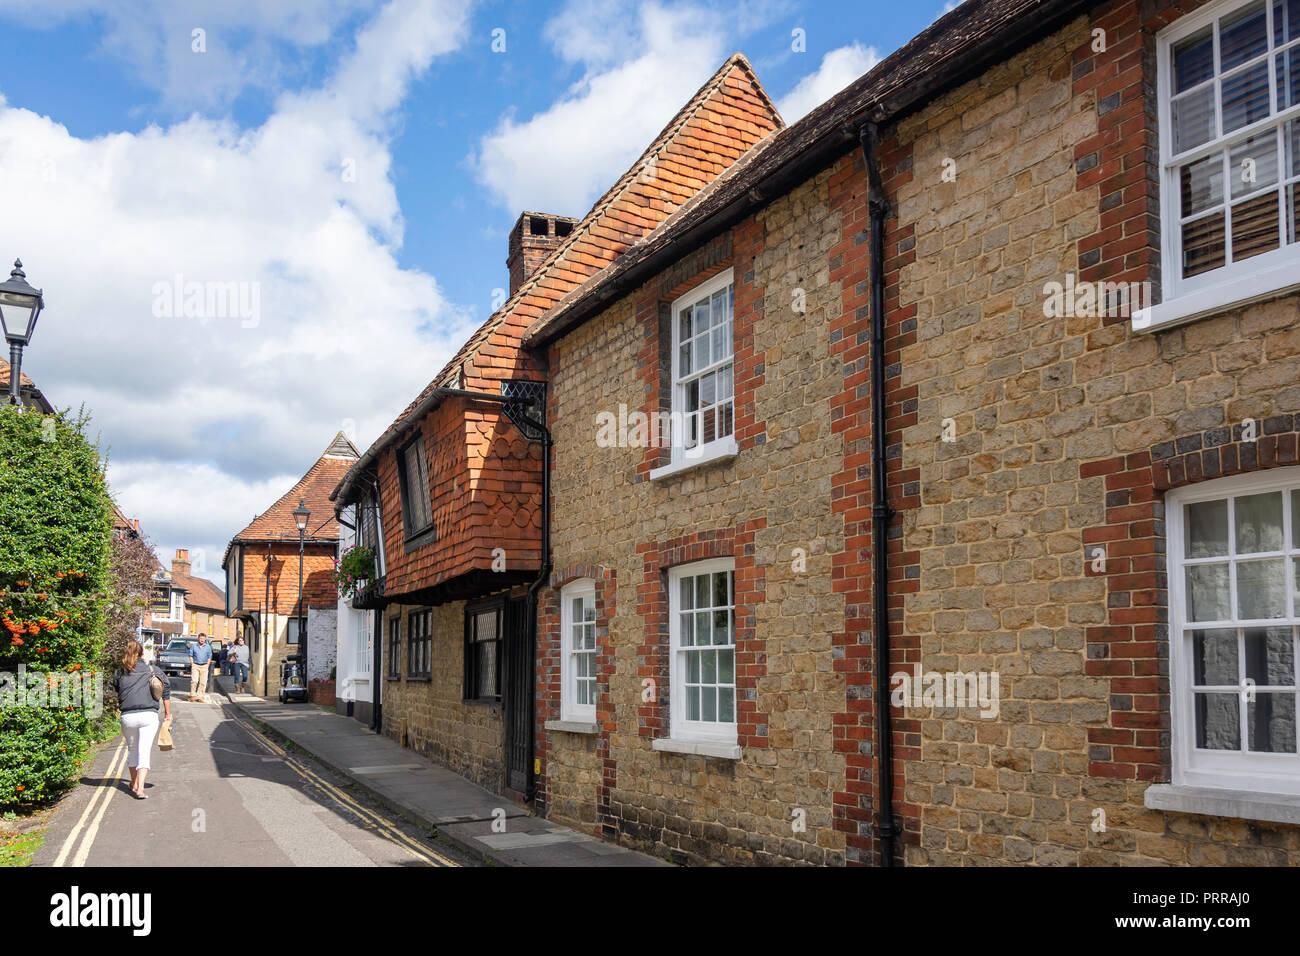 Period houses, Wool Lane, Midhurst, West Sussex, England, United Kingdom Stock Photo